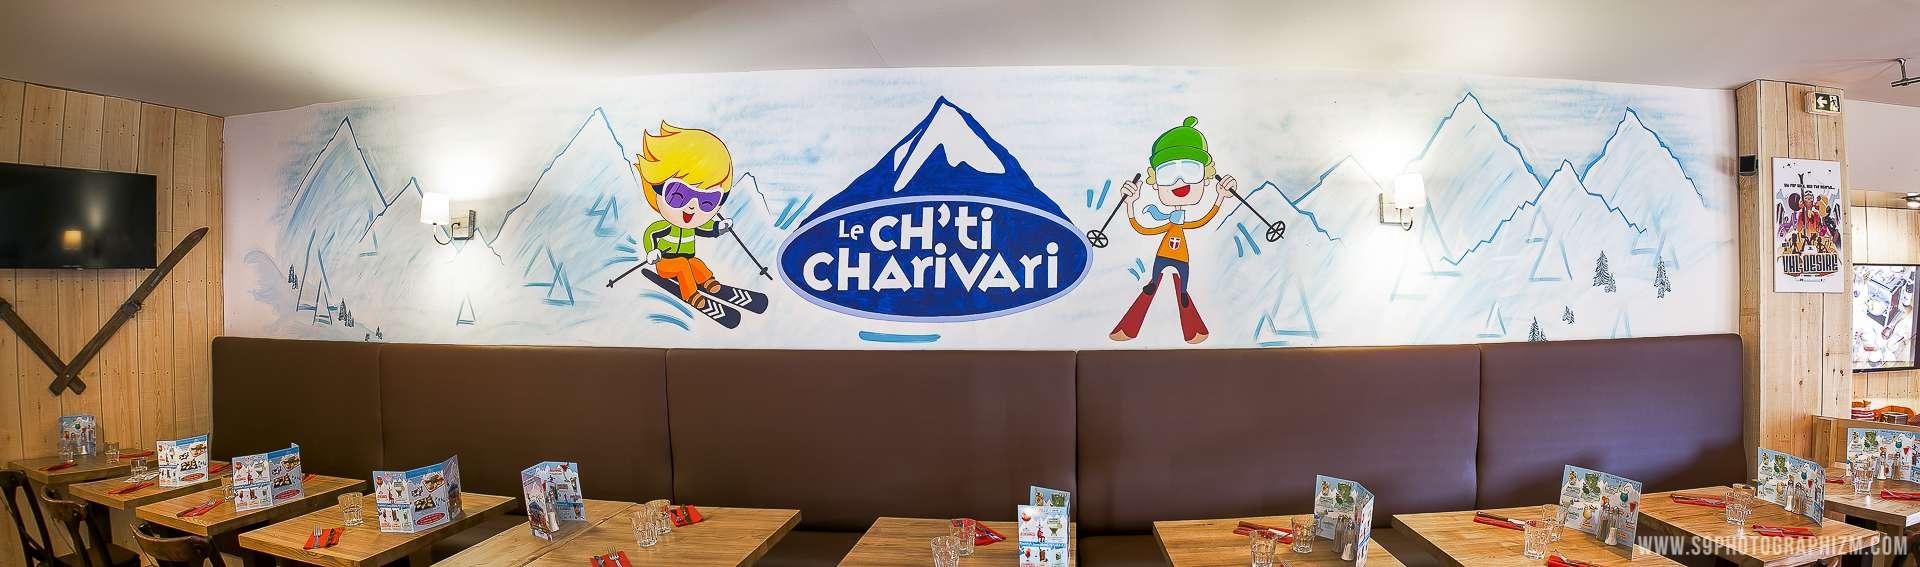 décoration ch'ti charivari lille s9photographizm